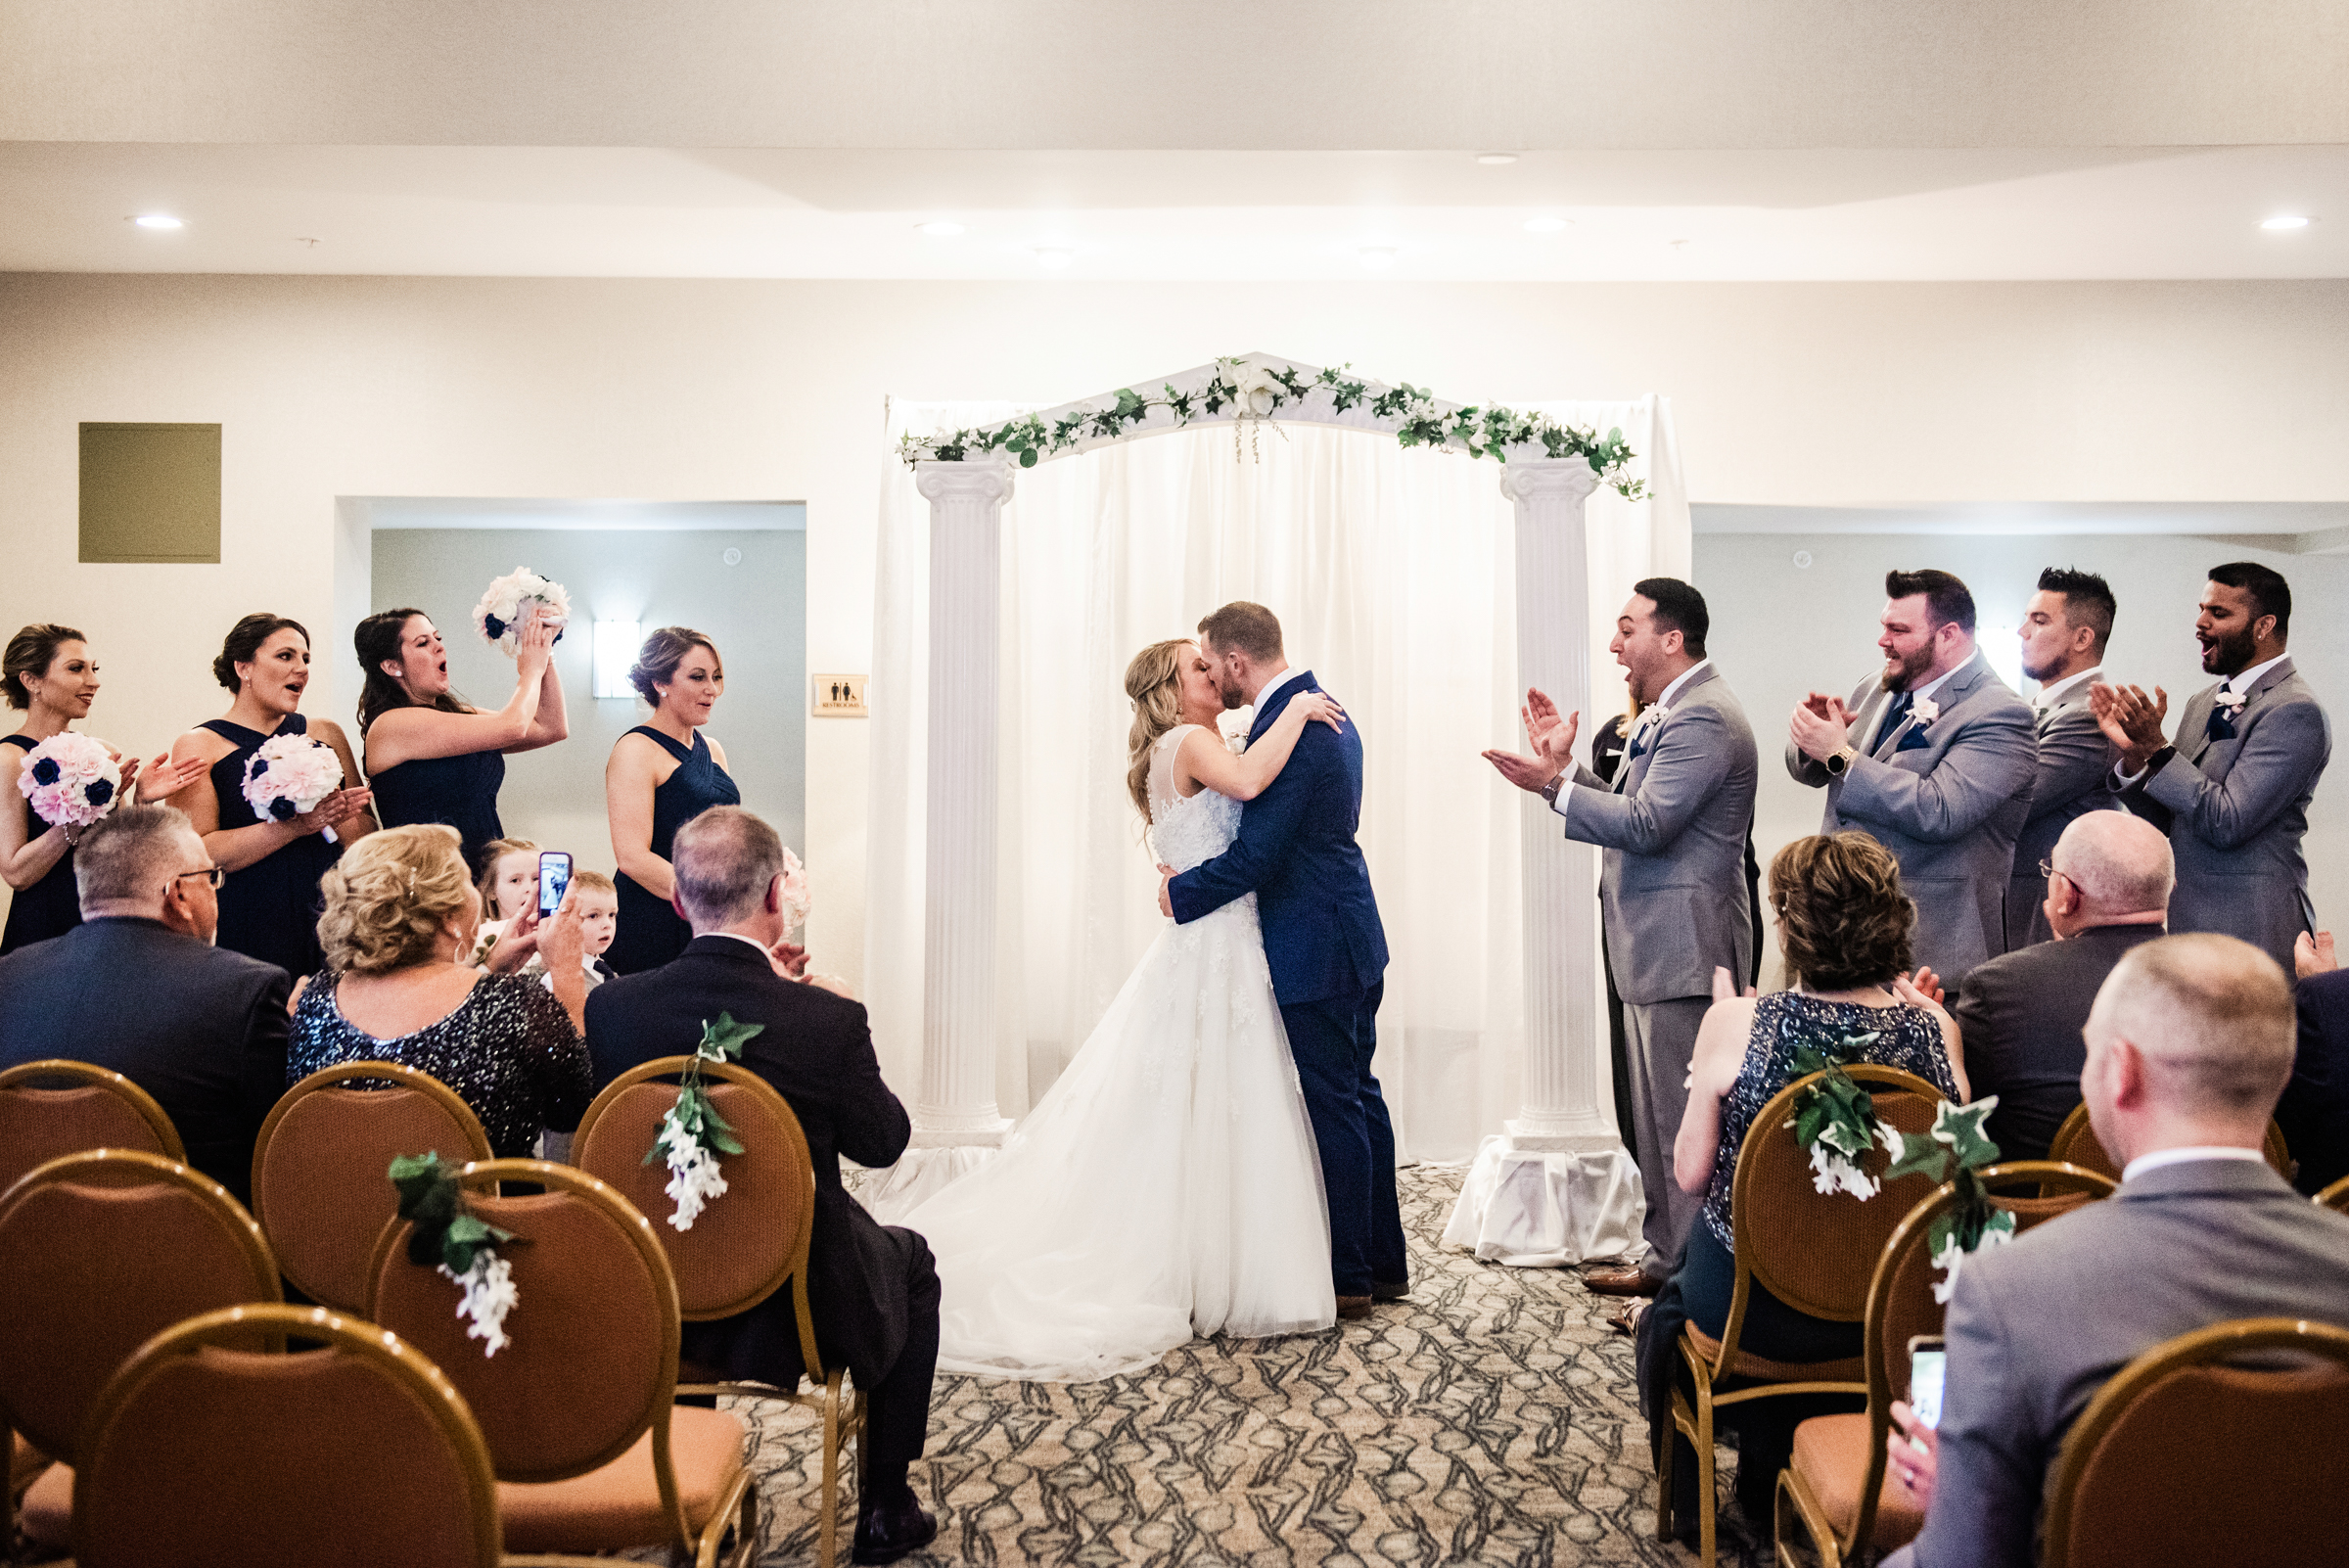 Double_Tree_by_Hilton_Rochester_Wedding_JILL_STUDIO_Rochester_NY_Photographer_DSC_4262.jpg